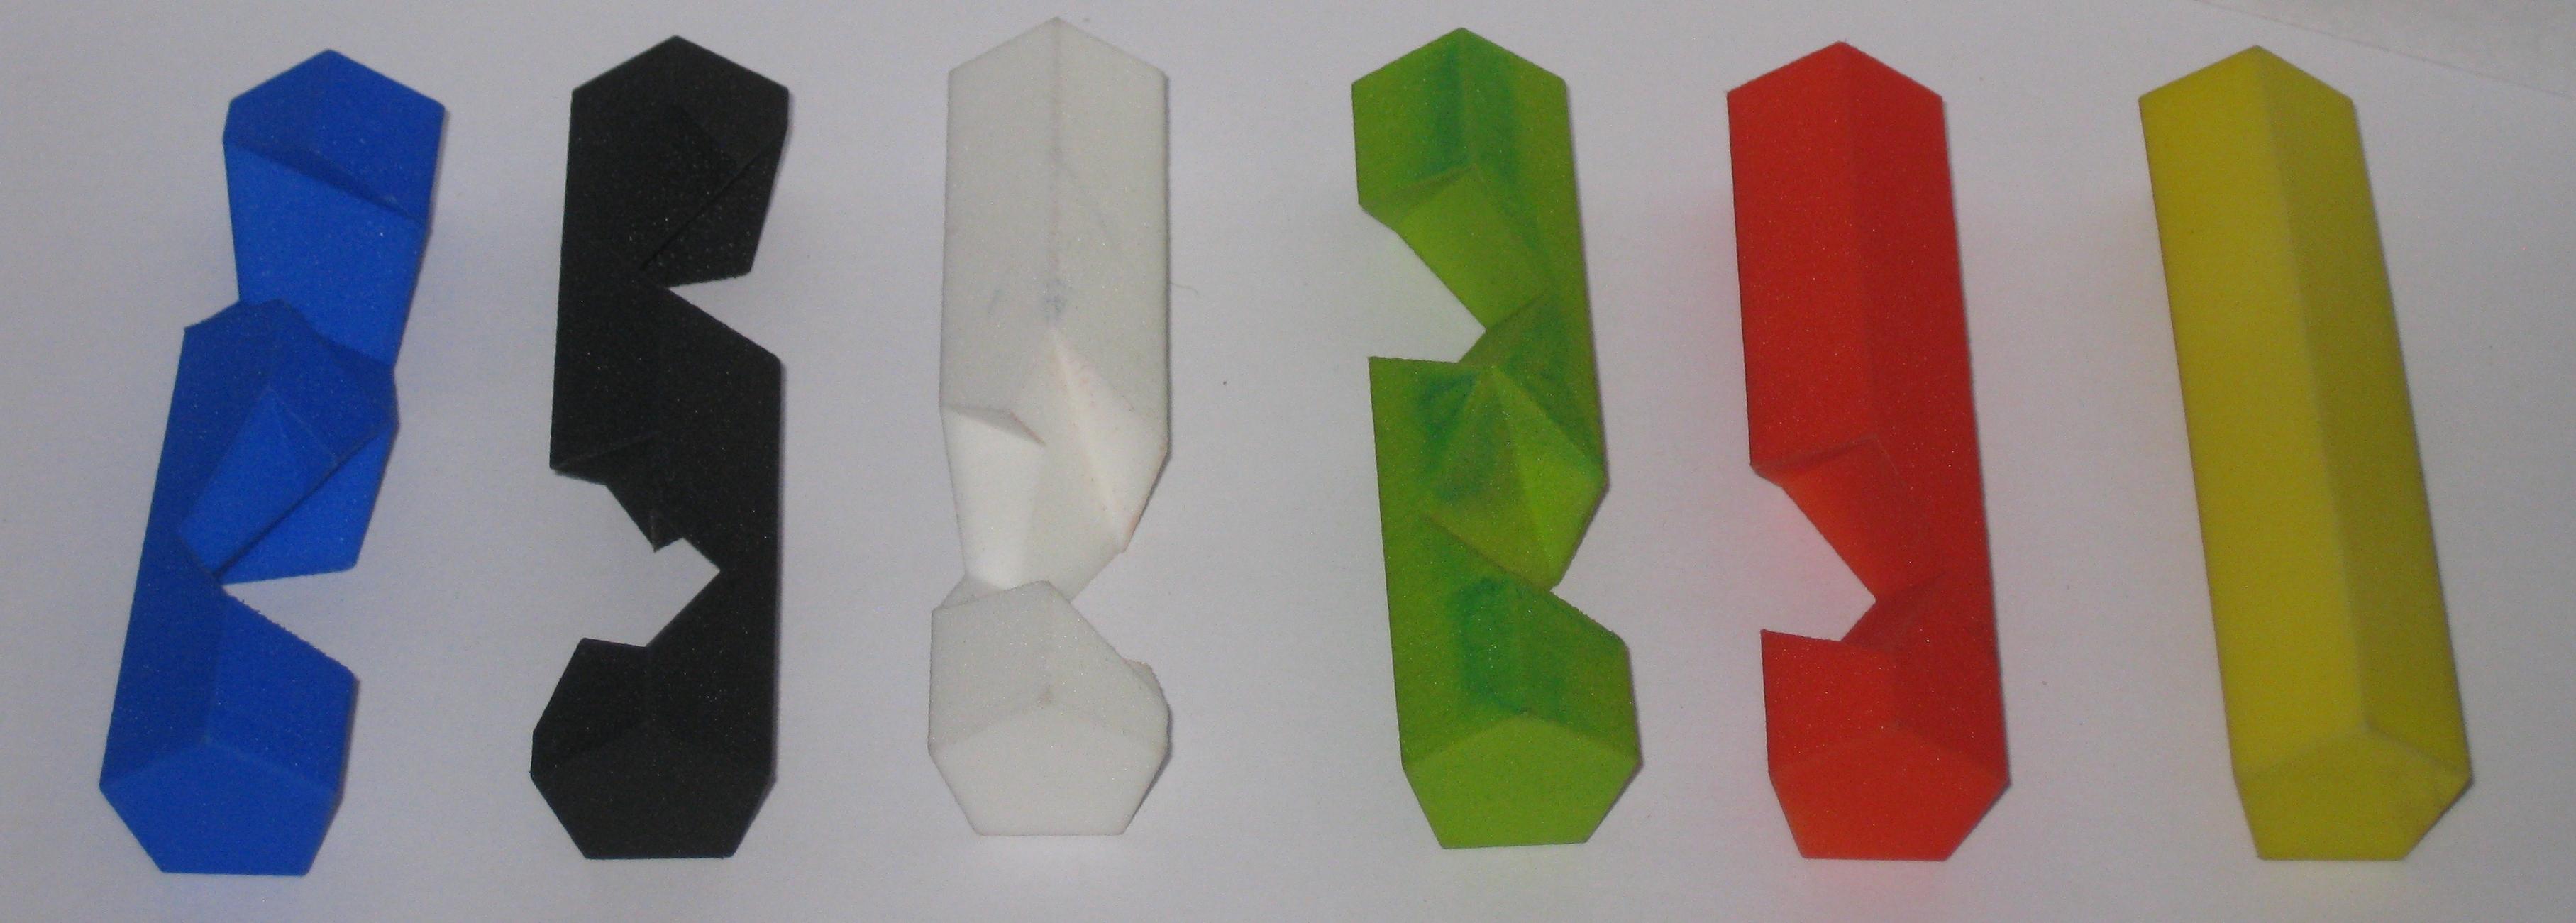 Six pentagonal pieces